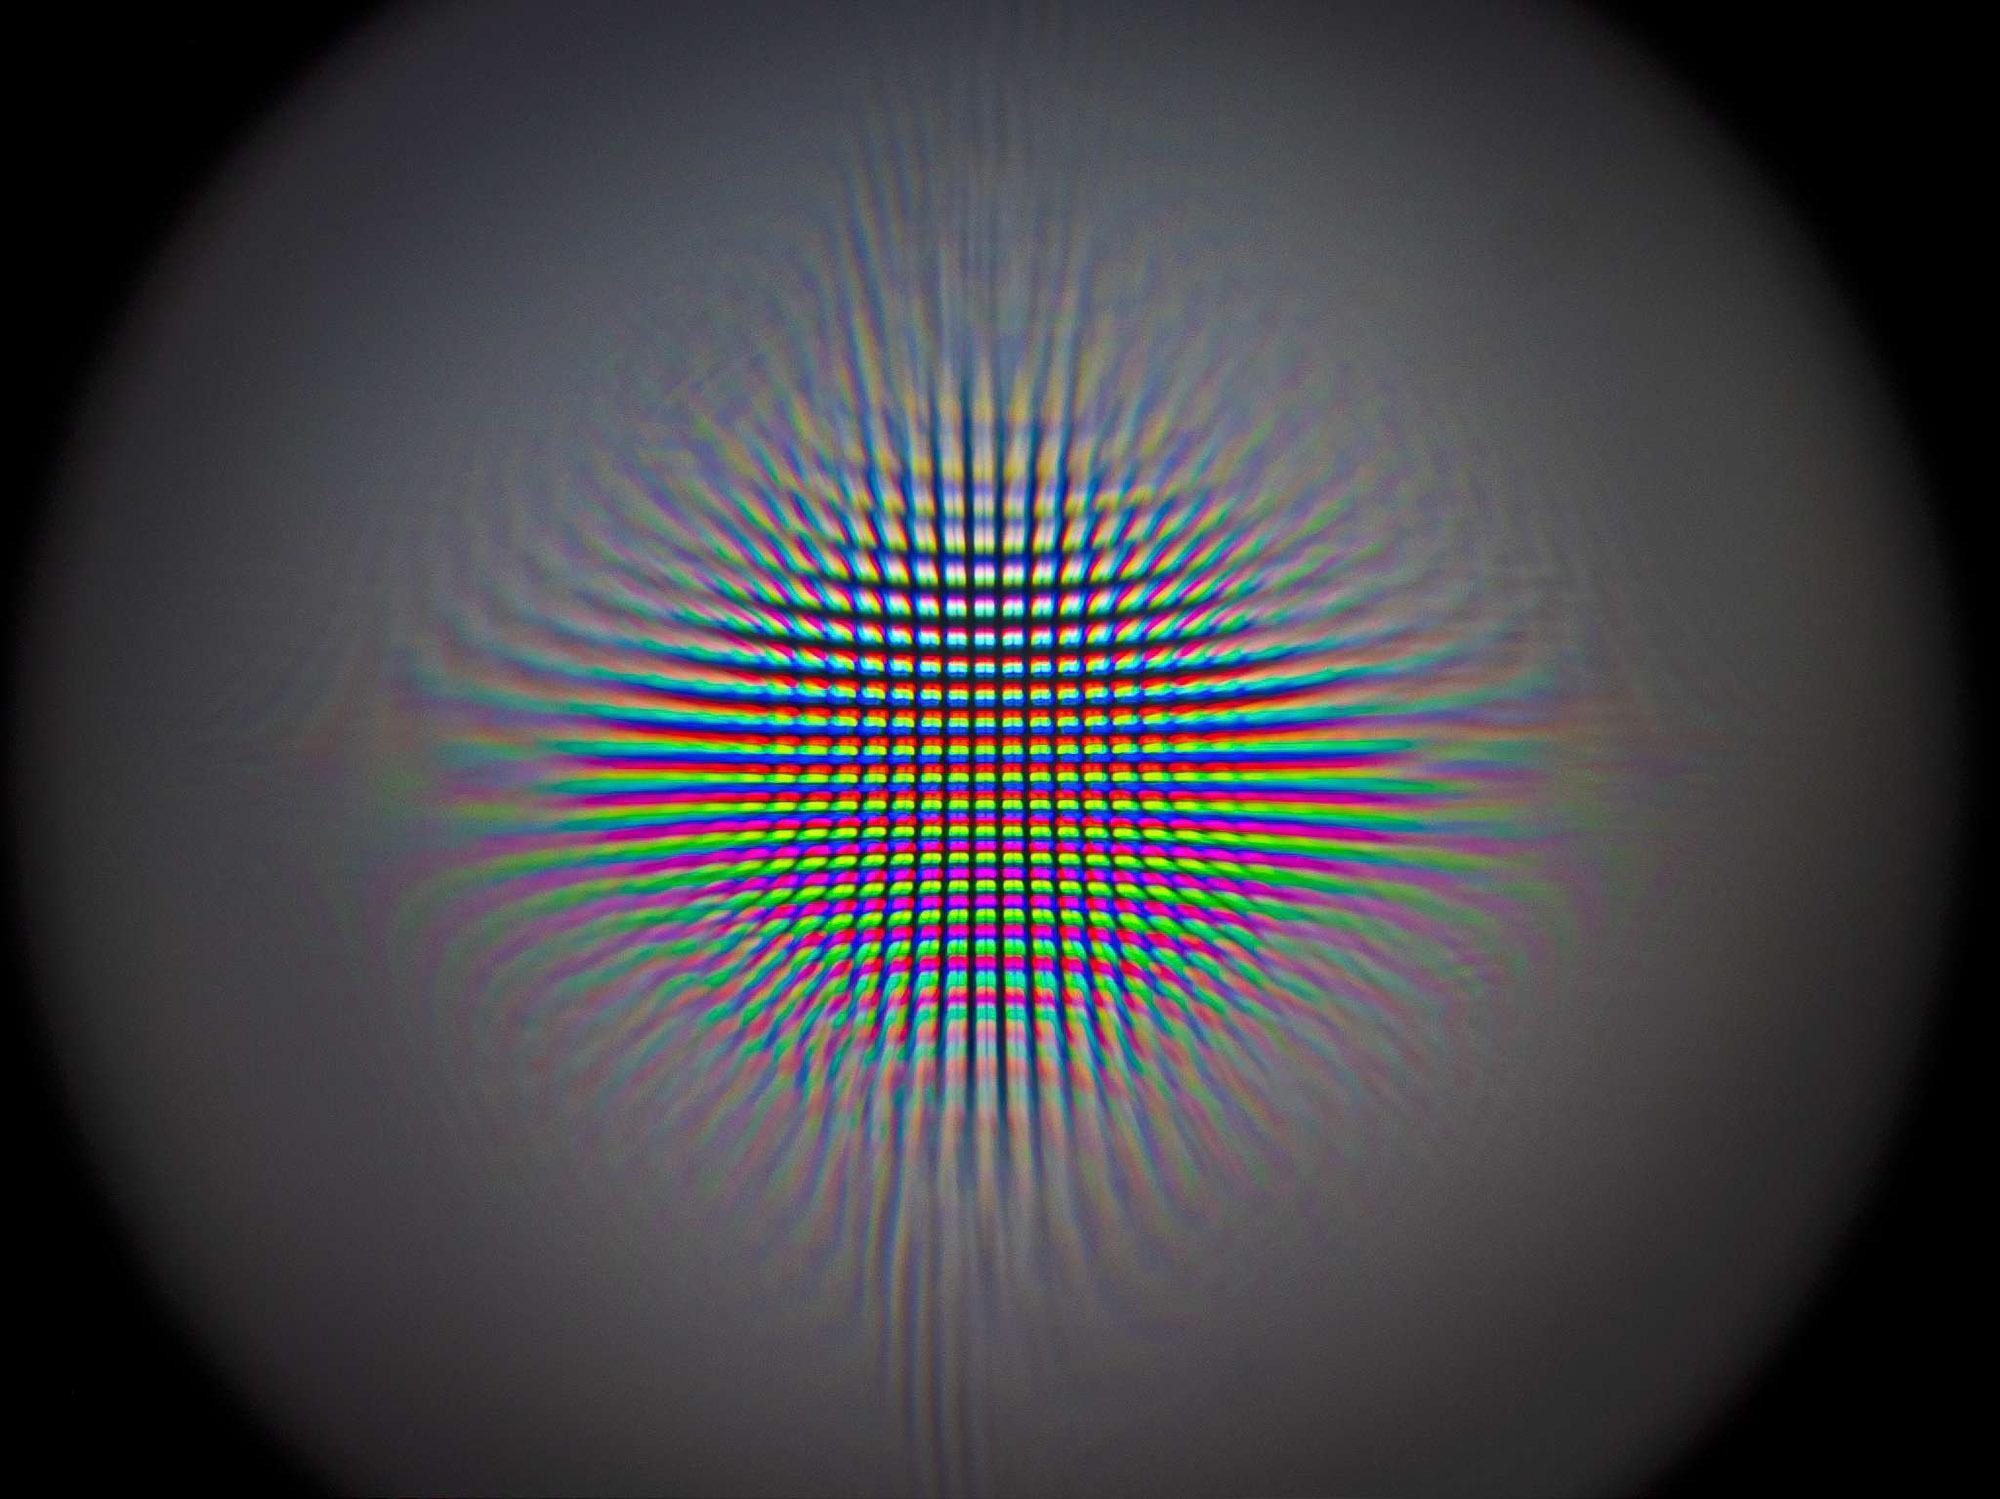 Crystal Ball Retina Display Pixel